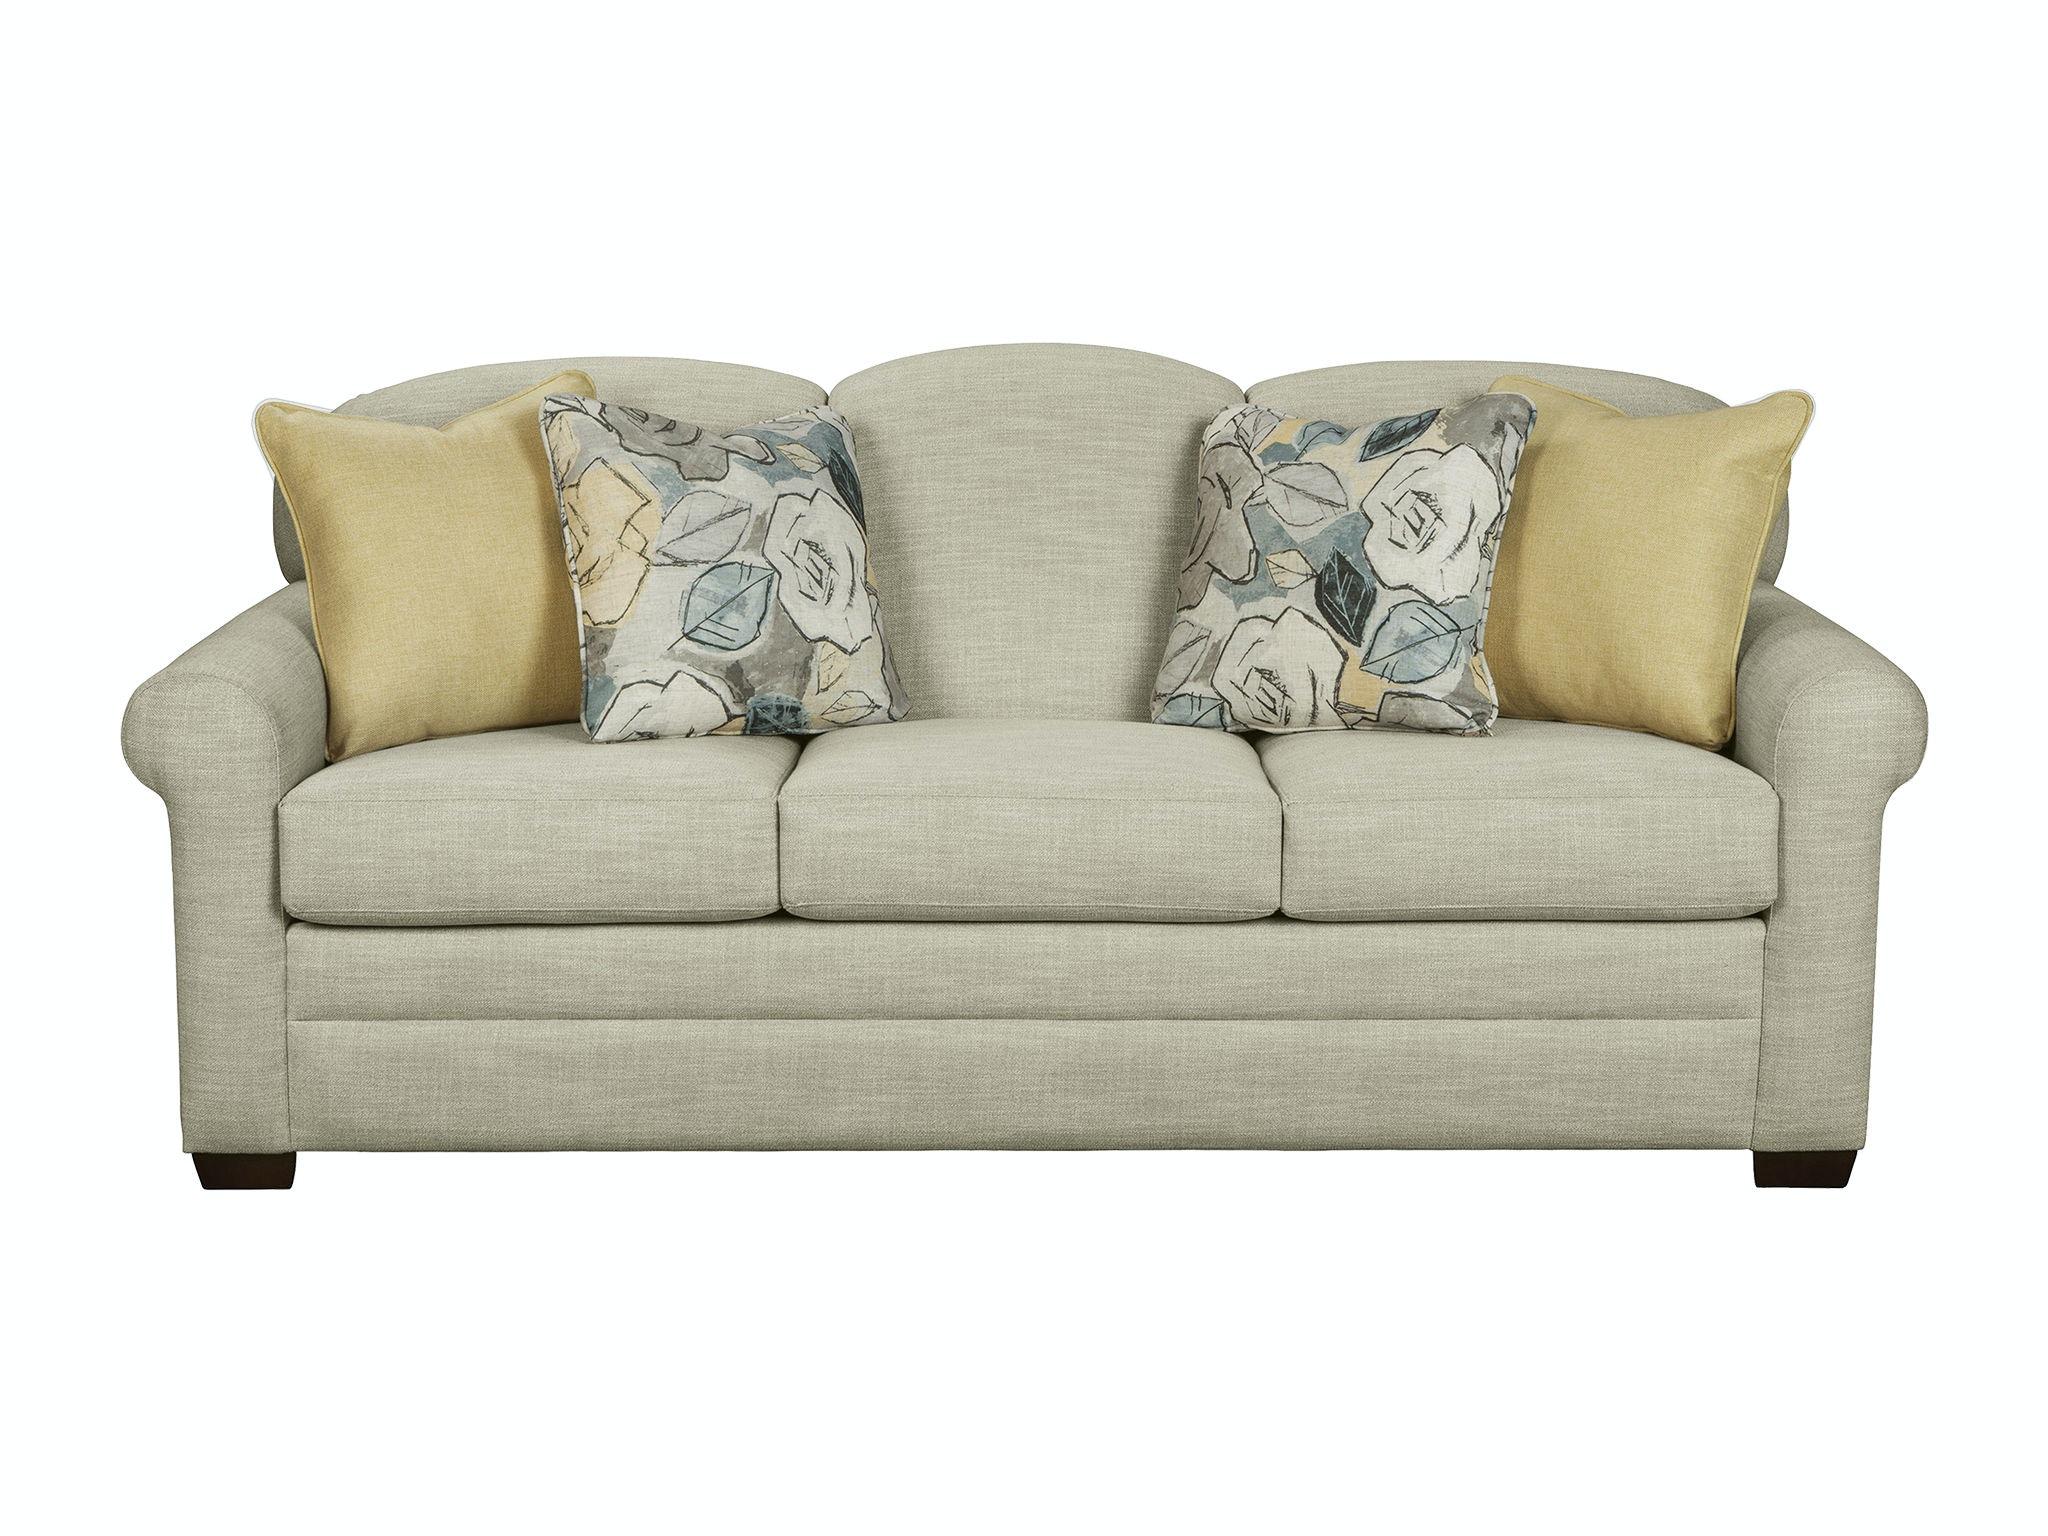 Cozy Life Sofa 778450 ...